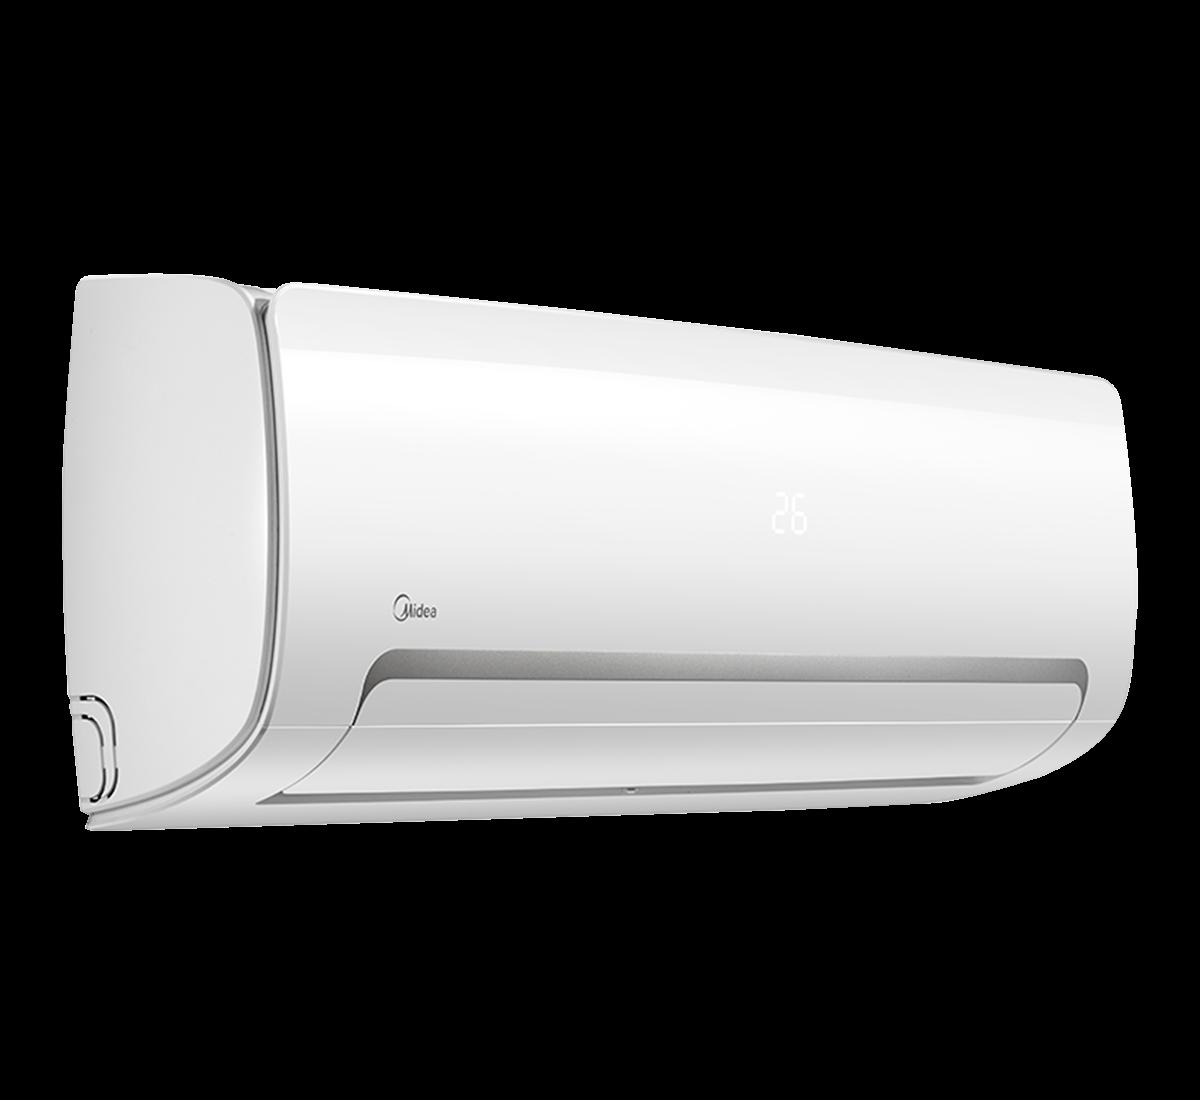 aire acondicionado unidad interior midea inverter msmbbu 12hrfn8 qrd6gw modelo mission ii 3512n8 instalacion incluida caseragua 02